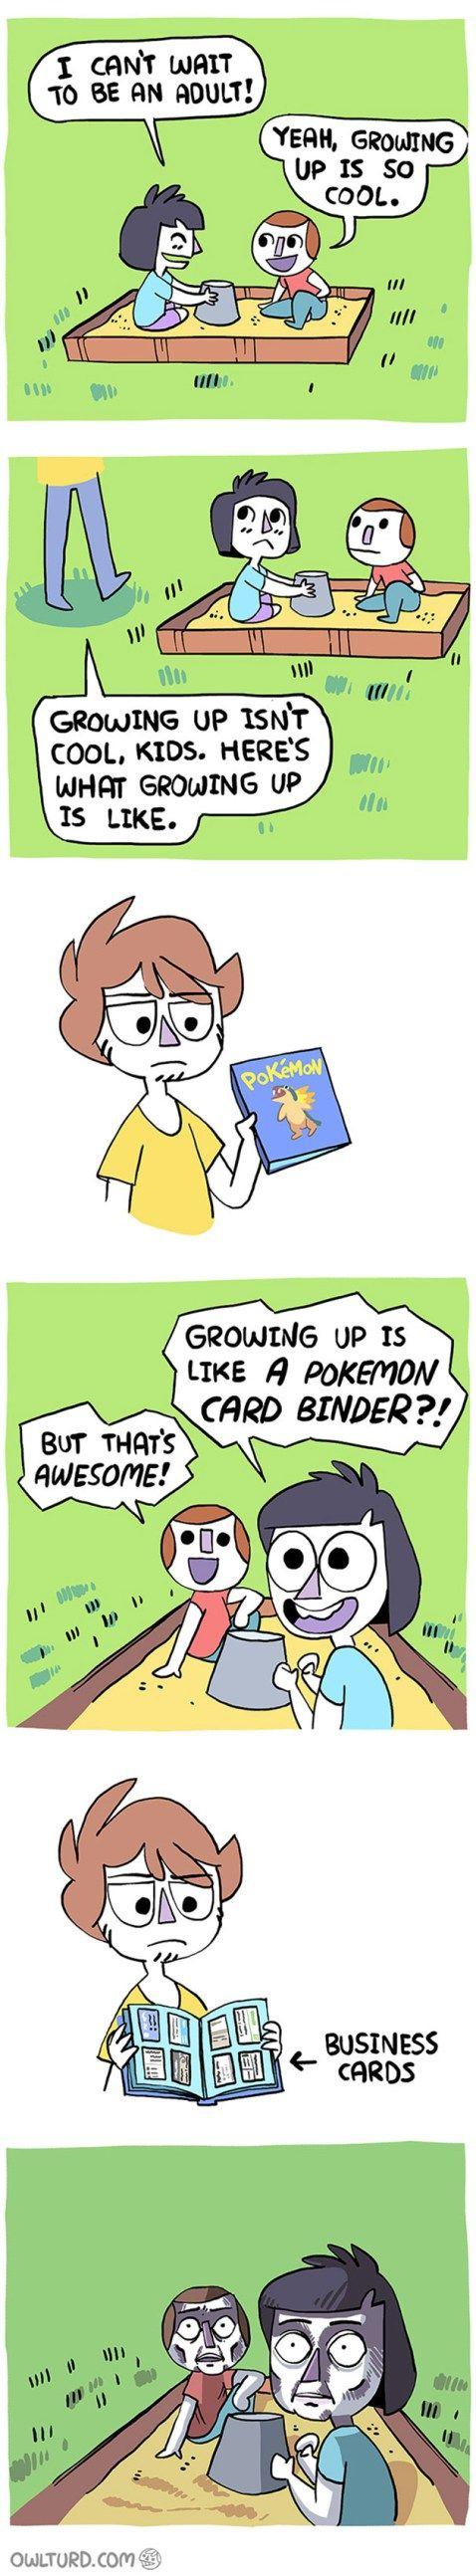 funny comics about life - photo #34